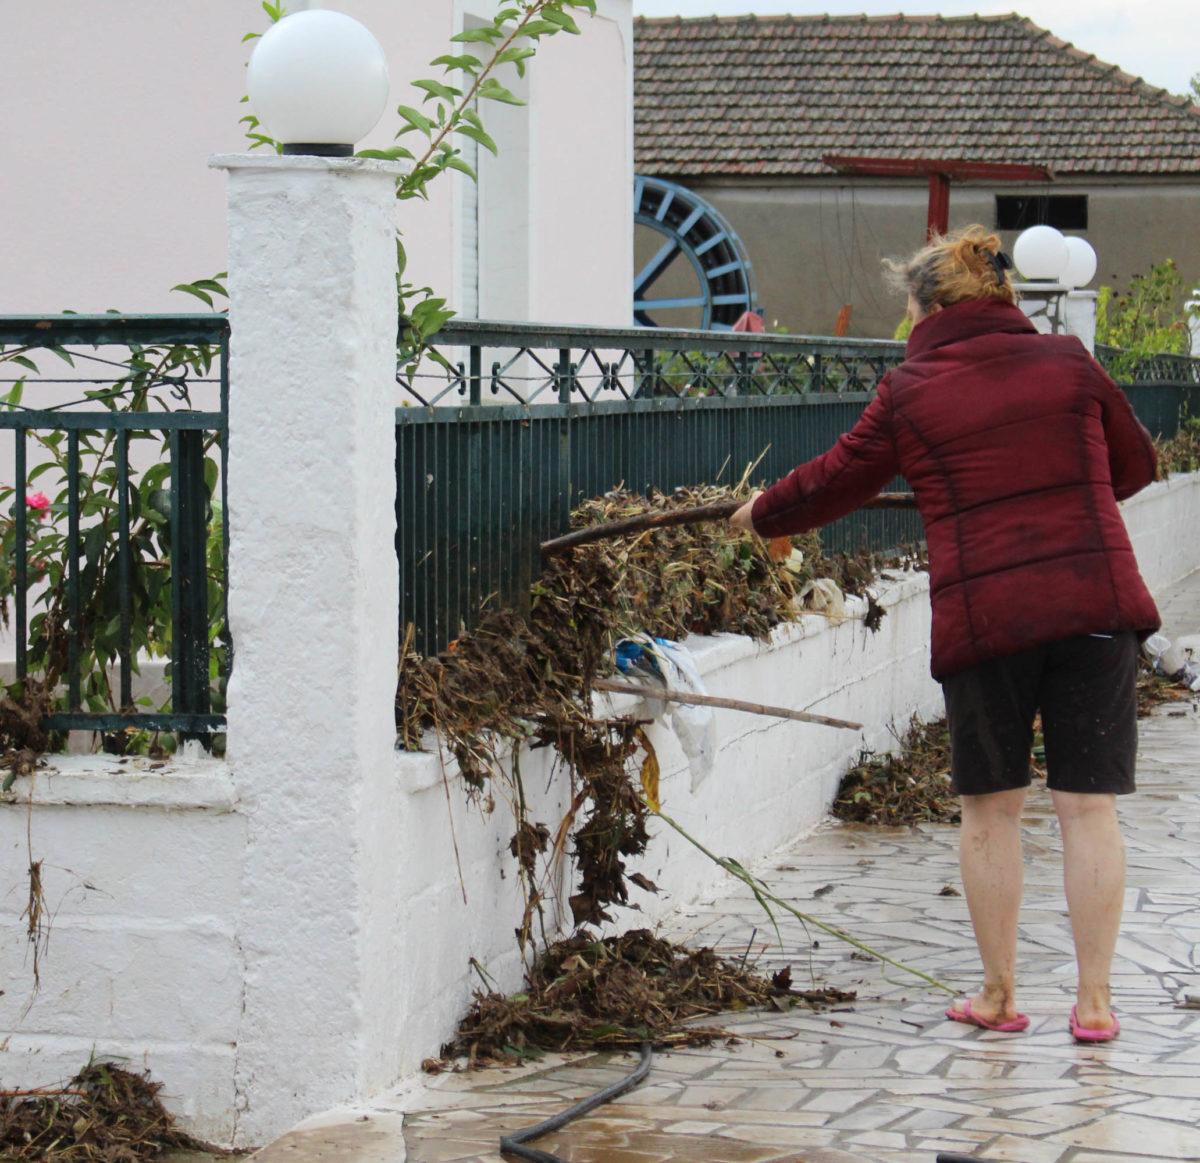 202009200552052062 1200x1163 - Εικόνες βιβλικής καταστροφής στα Φάρσαλα (δείτε φωτογραφίες)